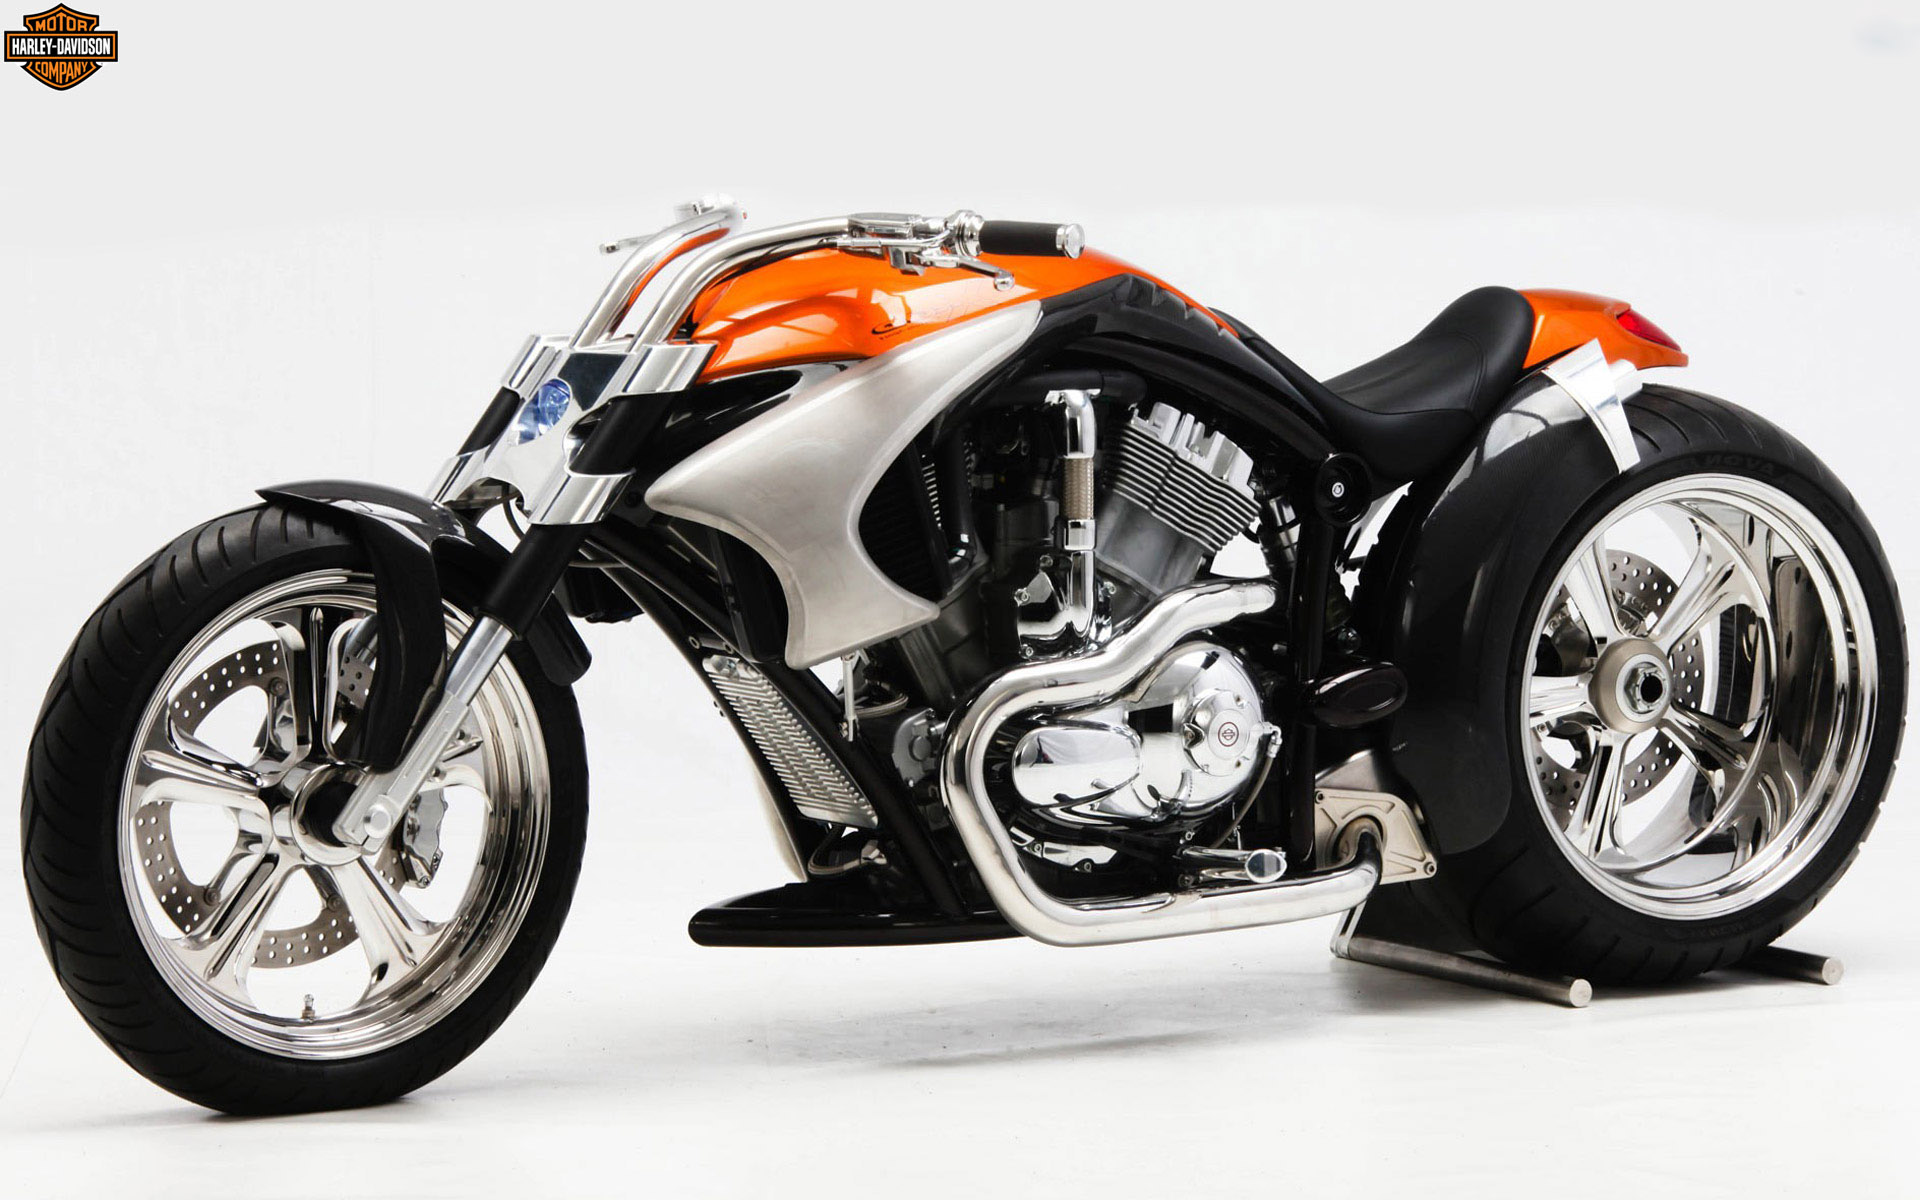 Iphone wallpaper chinese - Harley Davidson Motorcycle Wallpaper Wallpapersafari